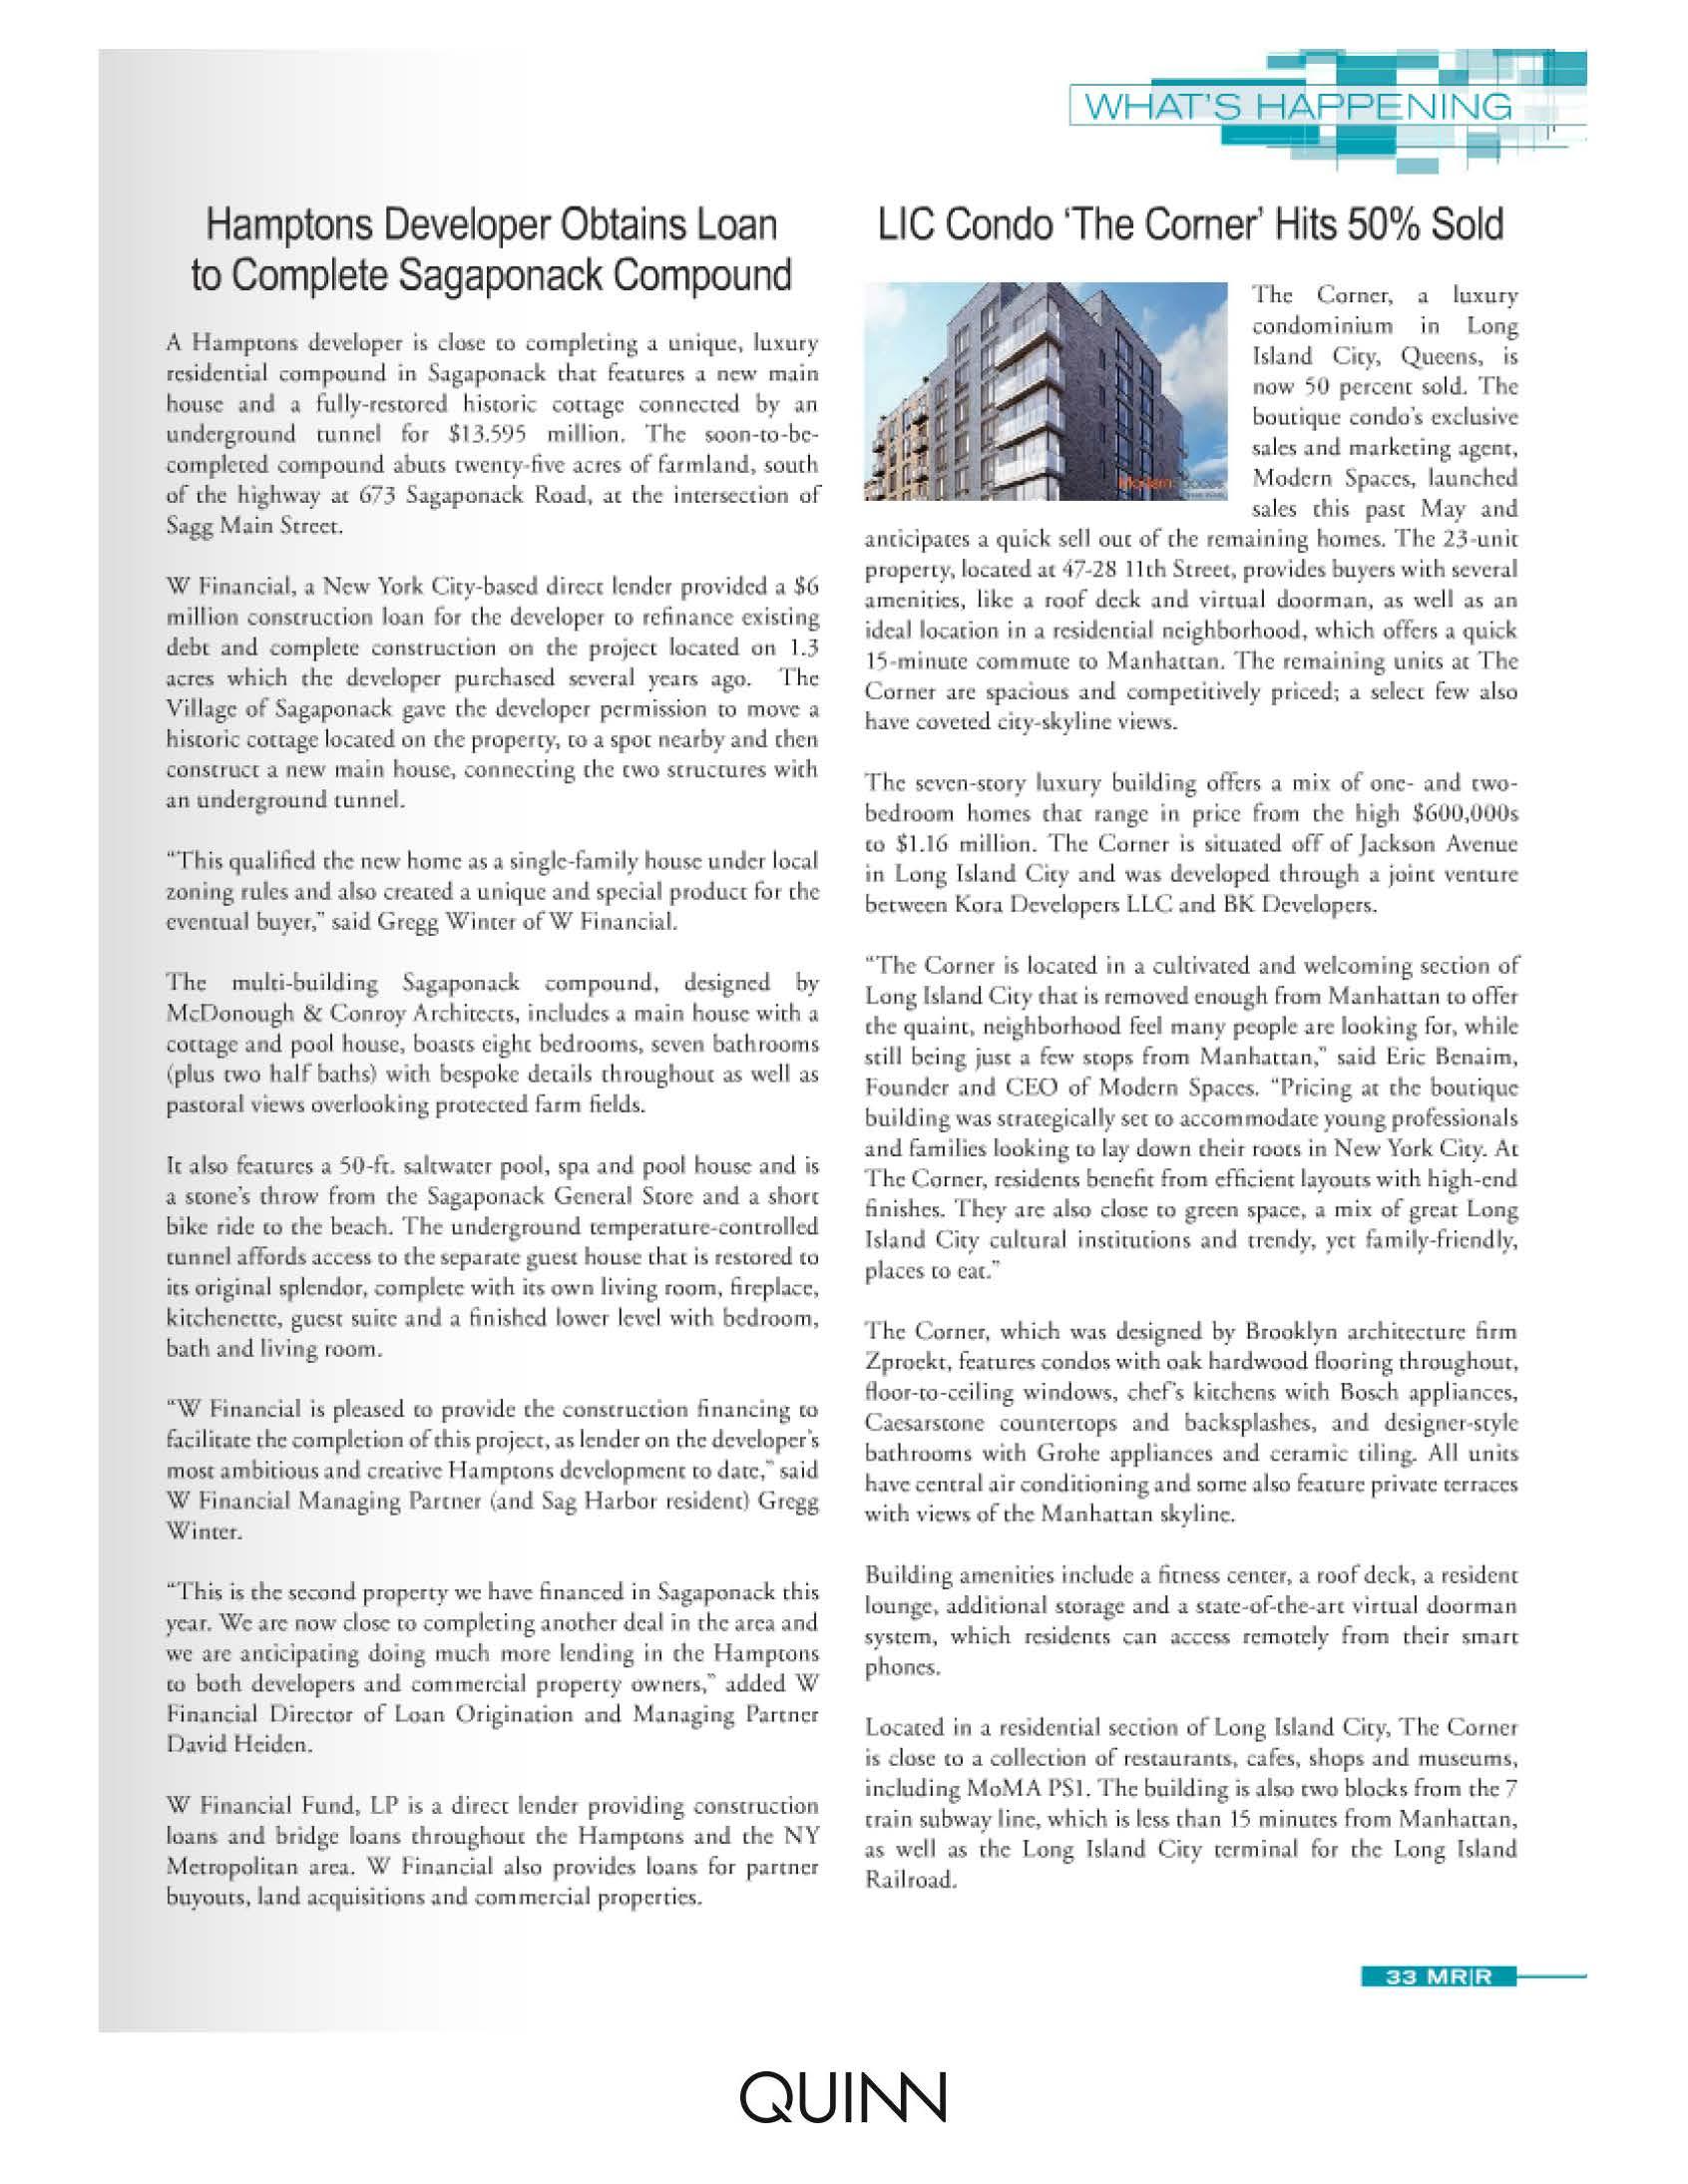 Mann Report - LIC Condo 'The Corner' Hits 50% Sold - 2.1.16_Page_2